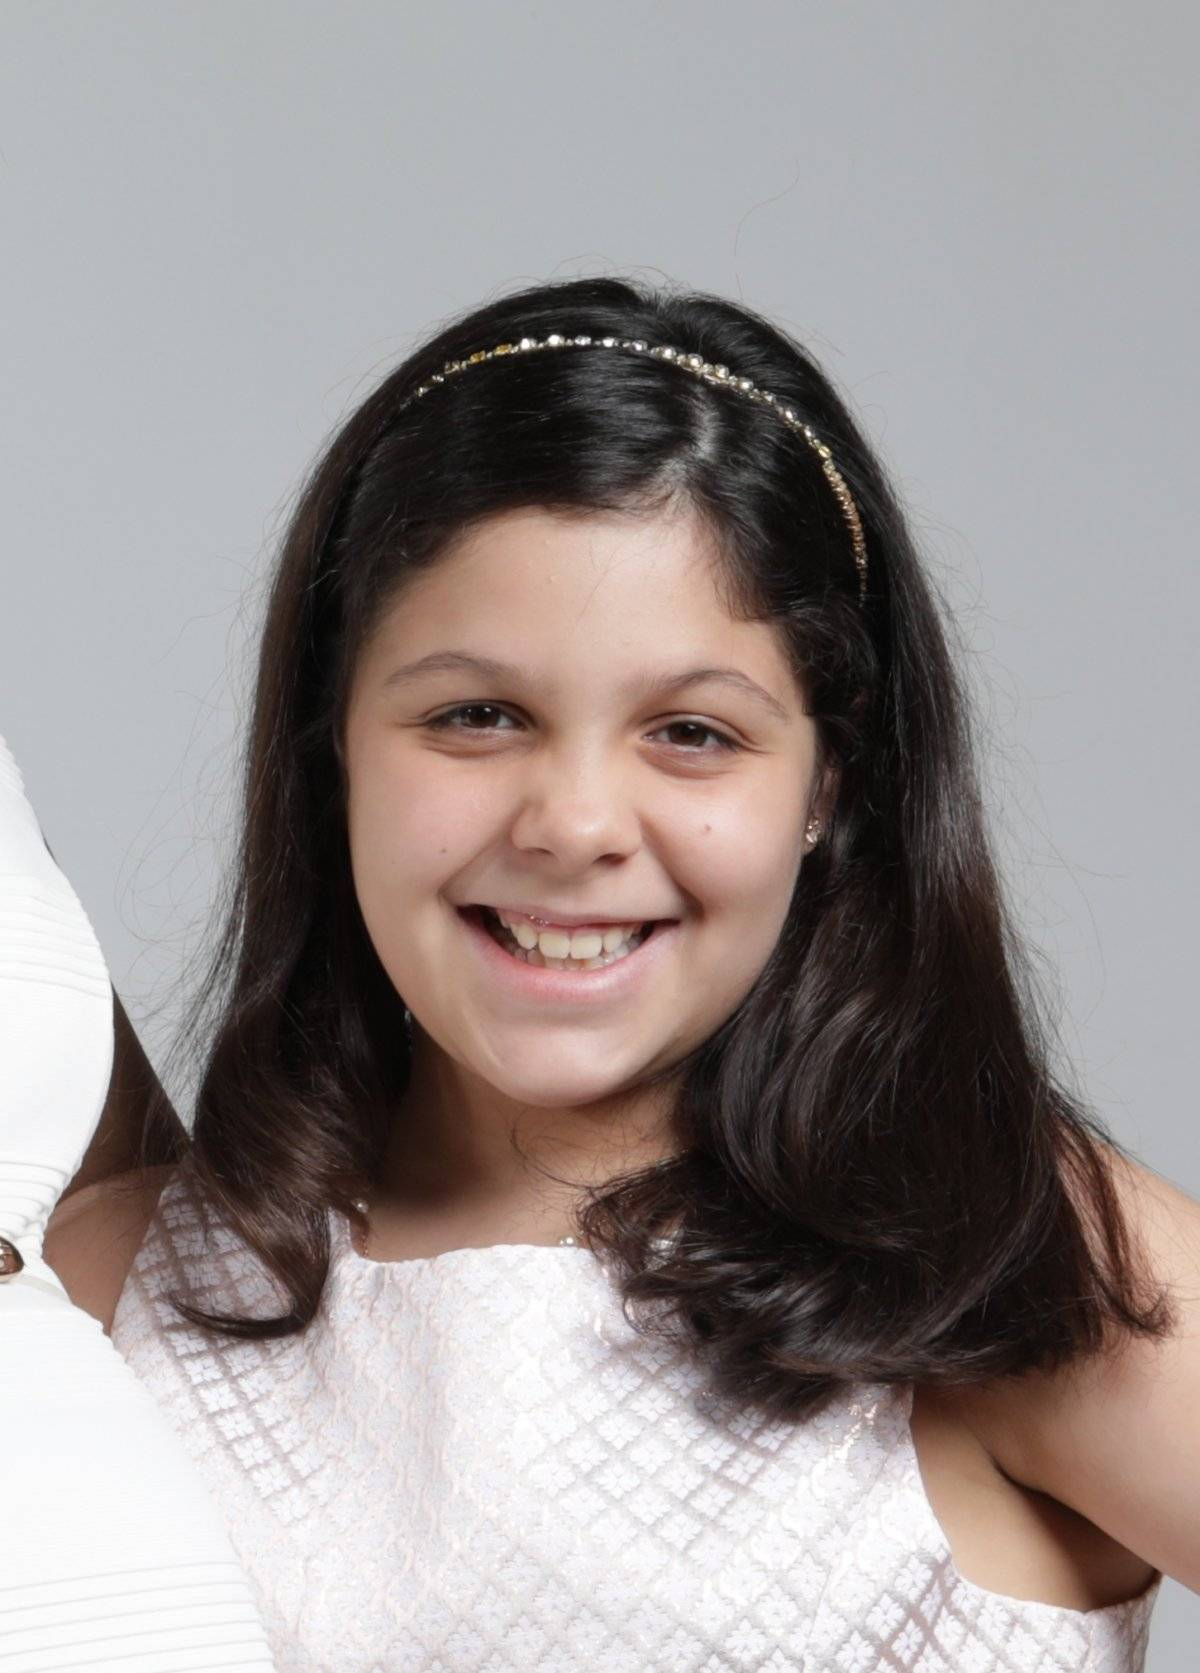 Marah Rivera Cucurullo